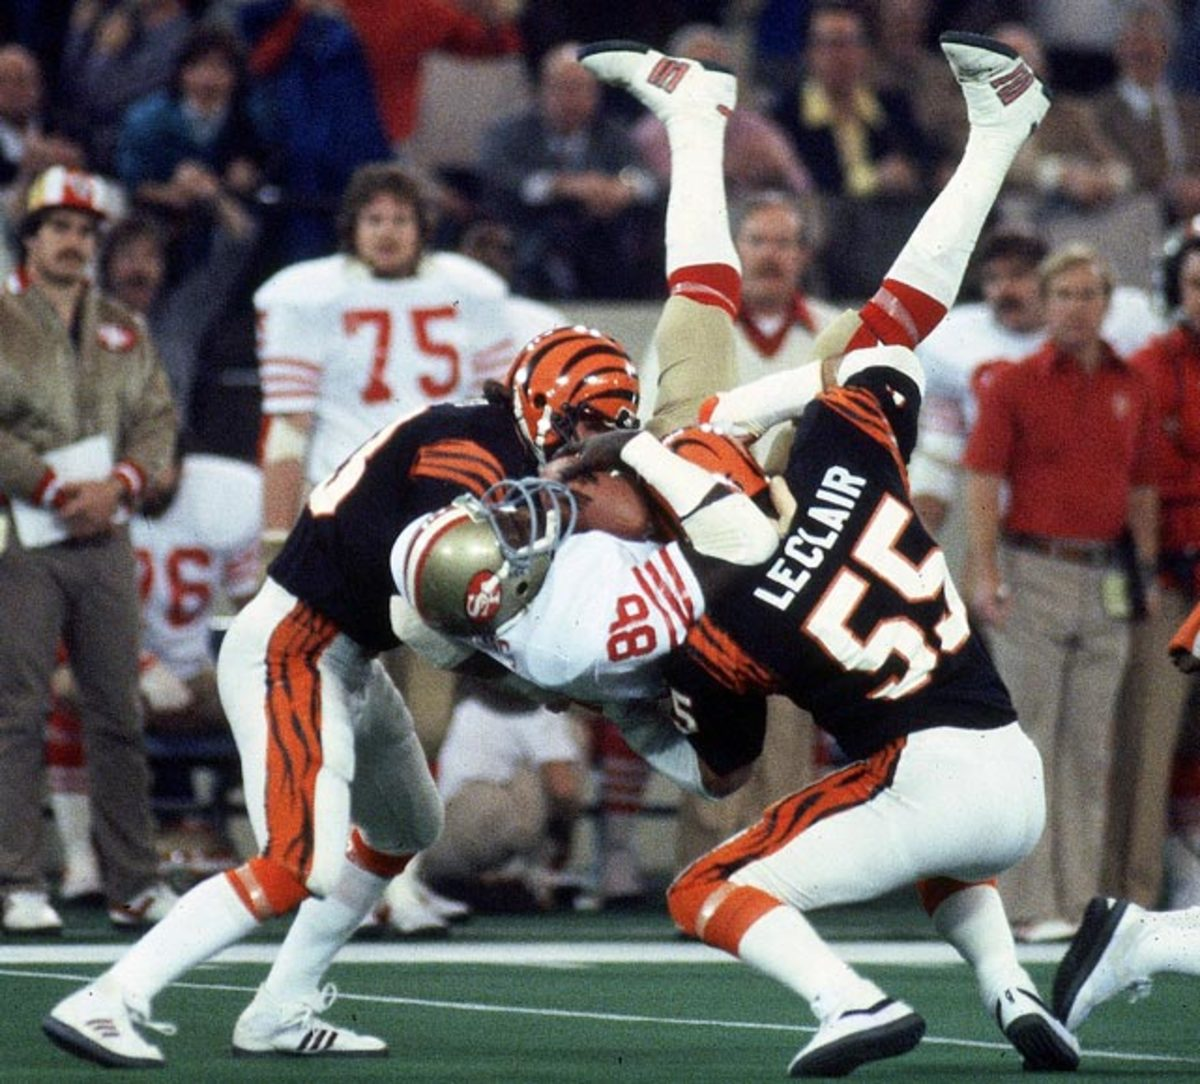 Super Bowl XVI, Jan. 24, 1982